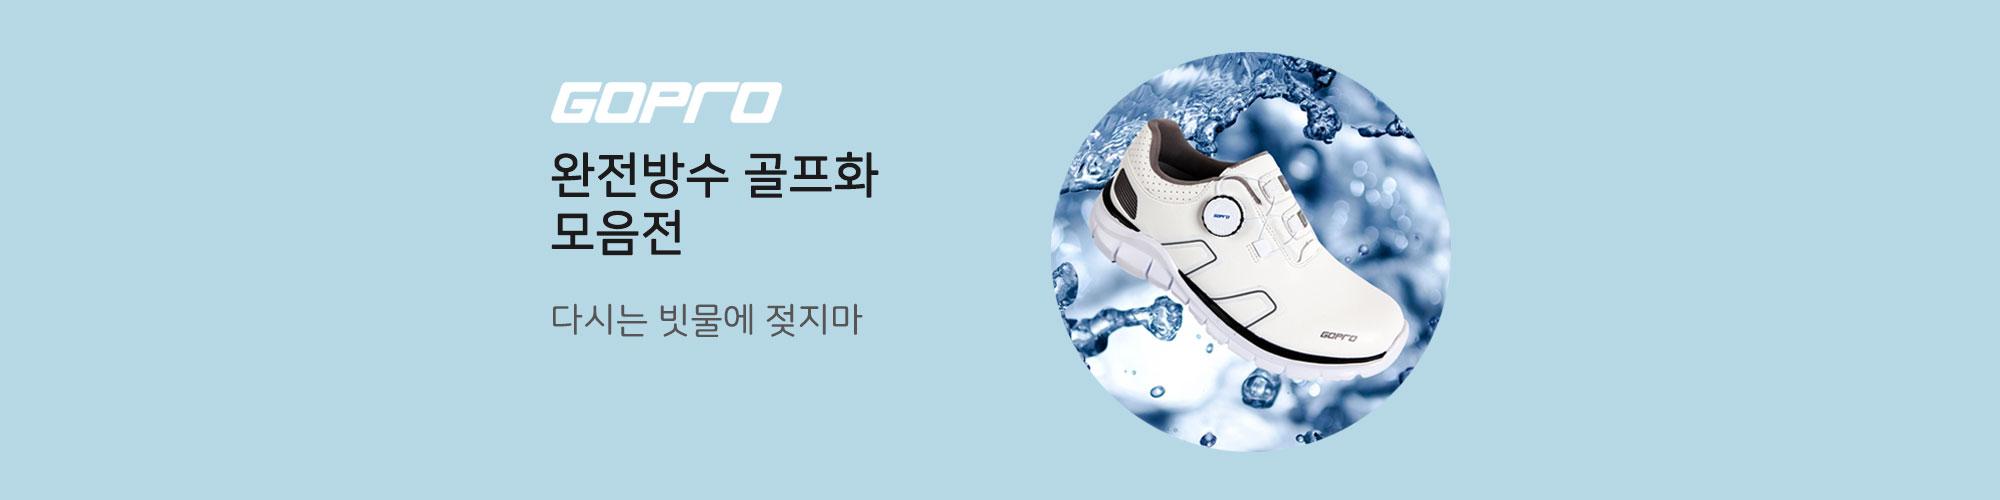 G-98(히말라야)